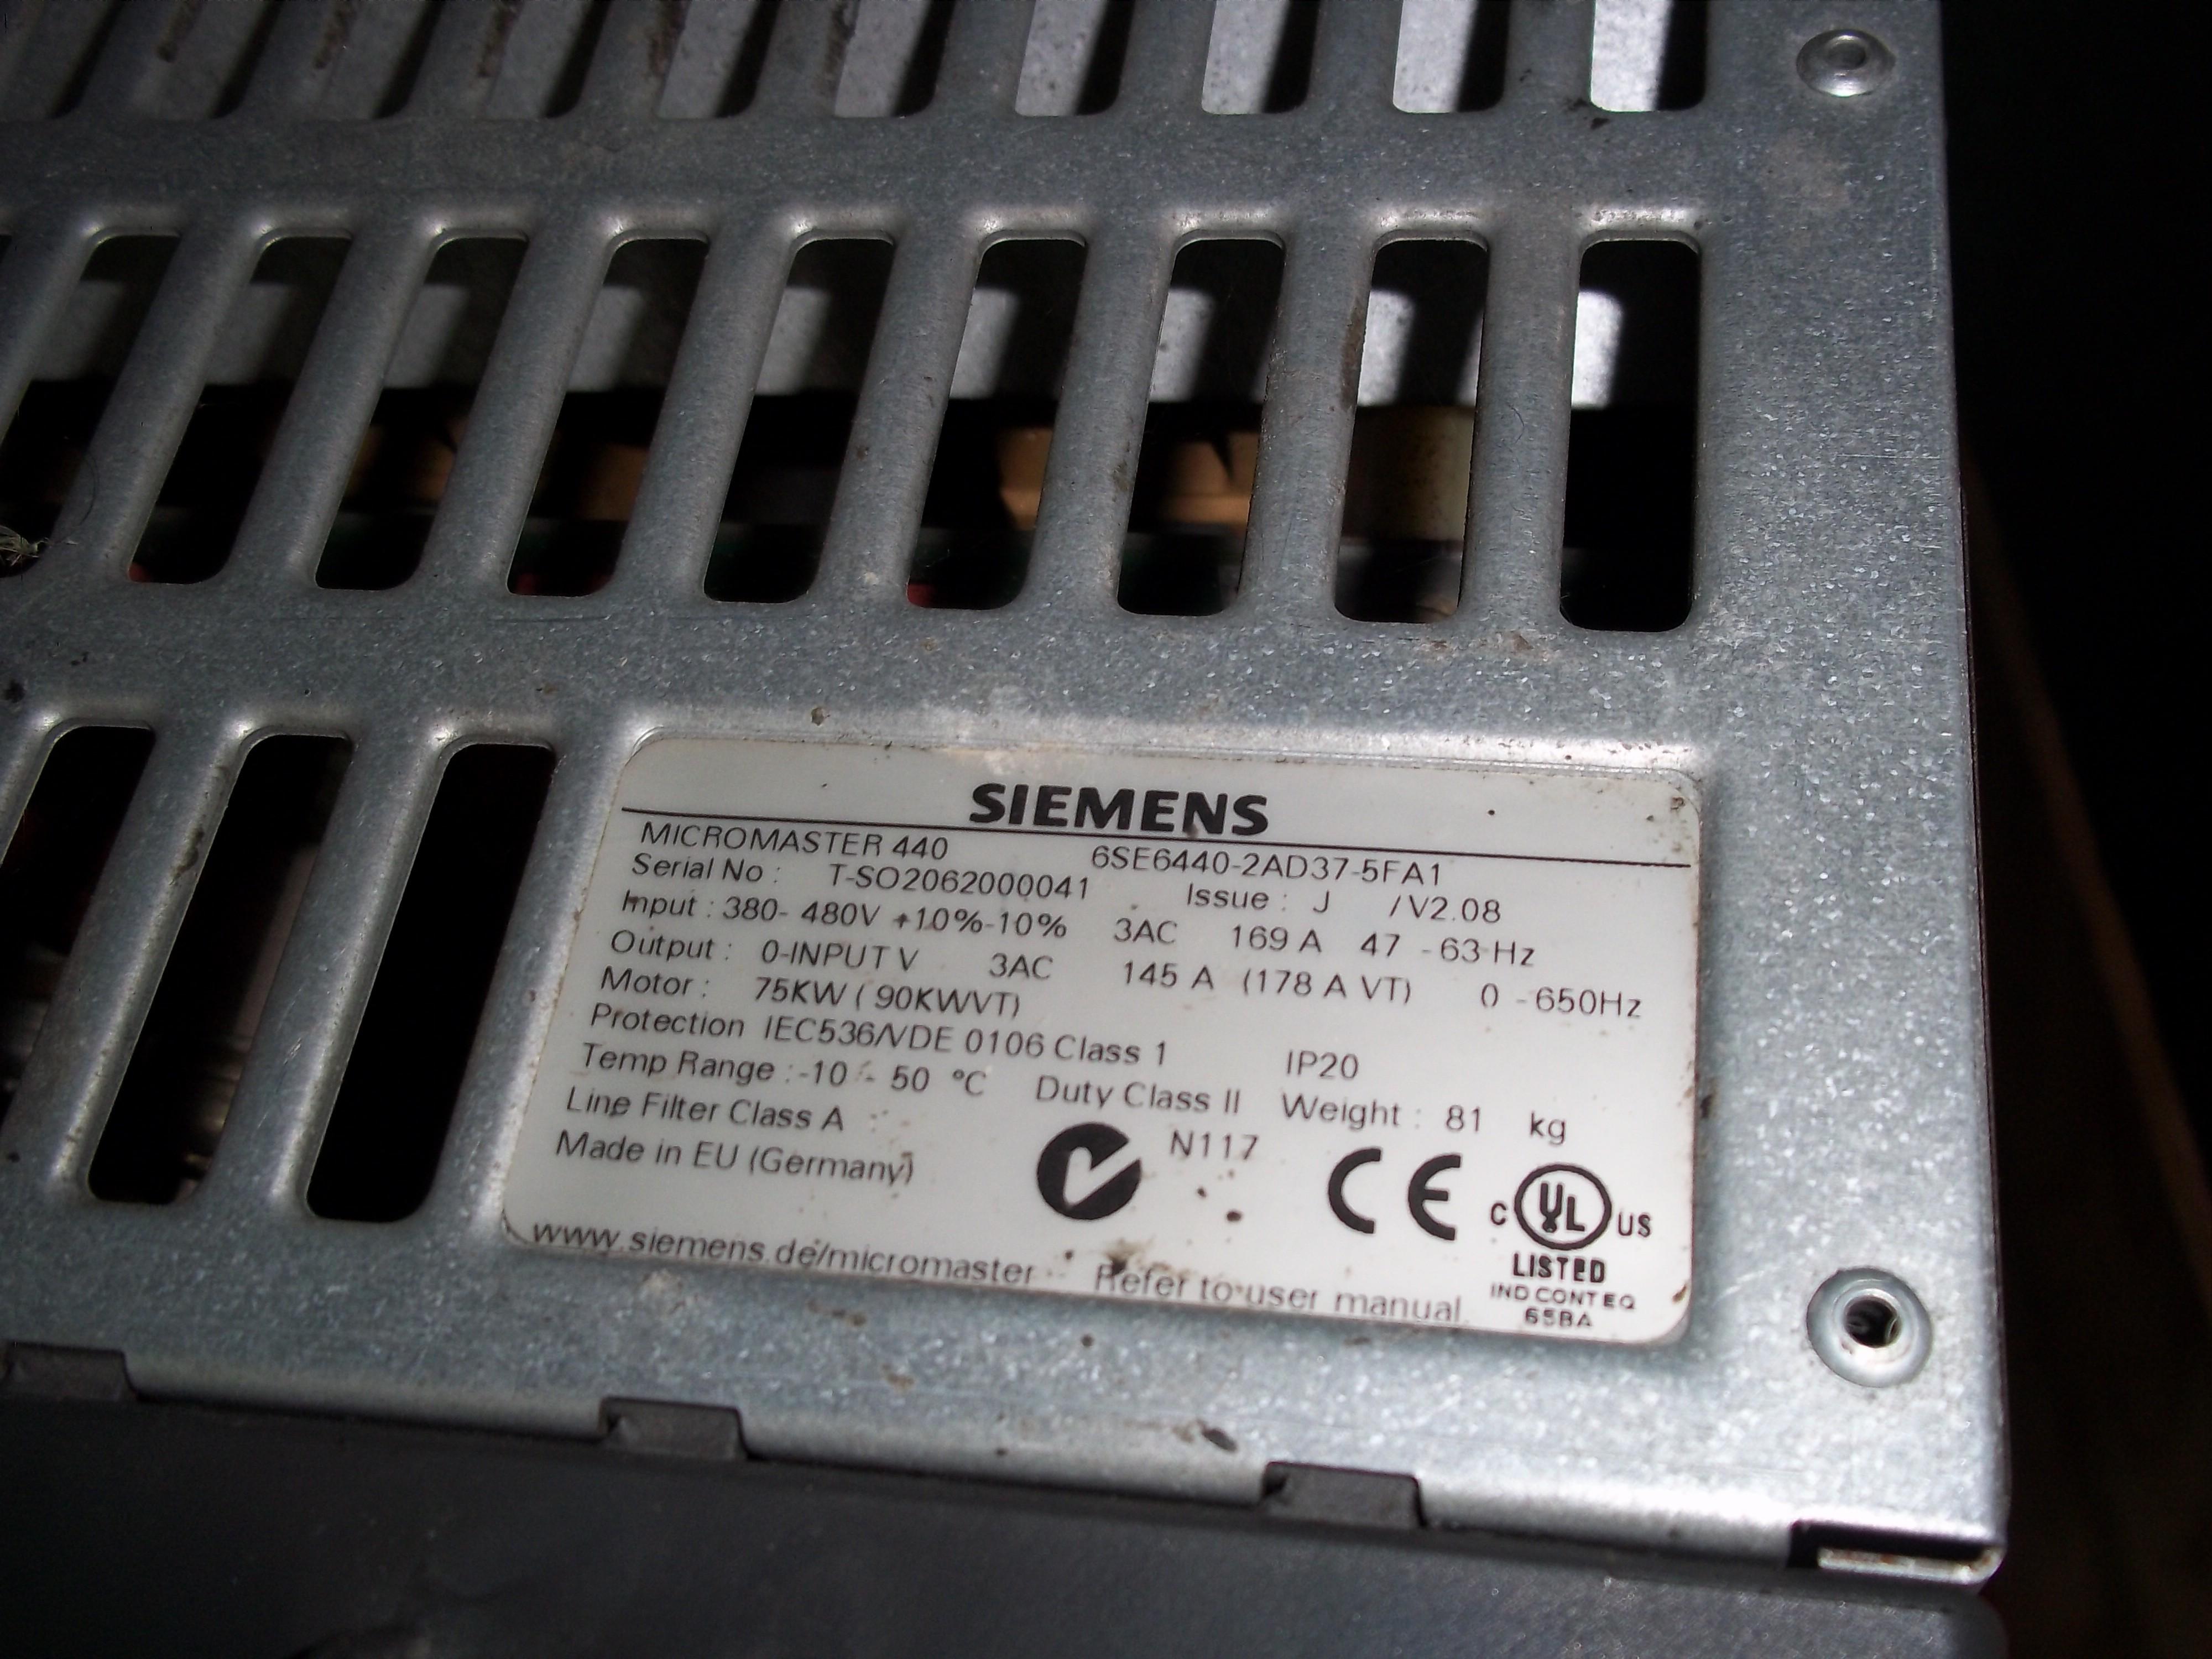 Repair 6SE6440-2AD37-5FA1 SIEMENS SIEMENS MICROMASTER 440 in Malaysia, Singapore, Thailand, Indonesia